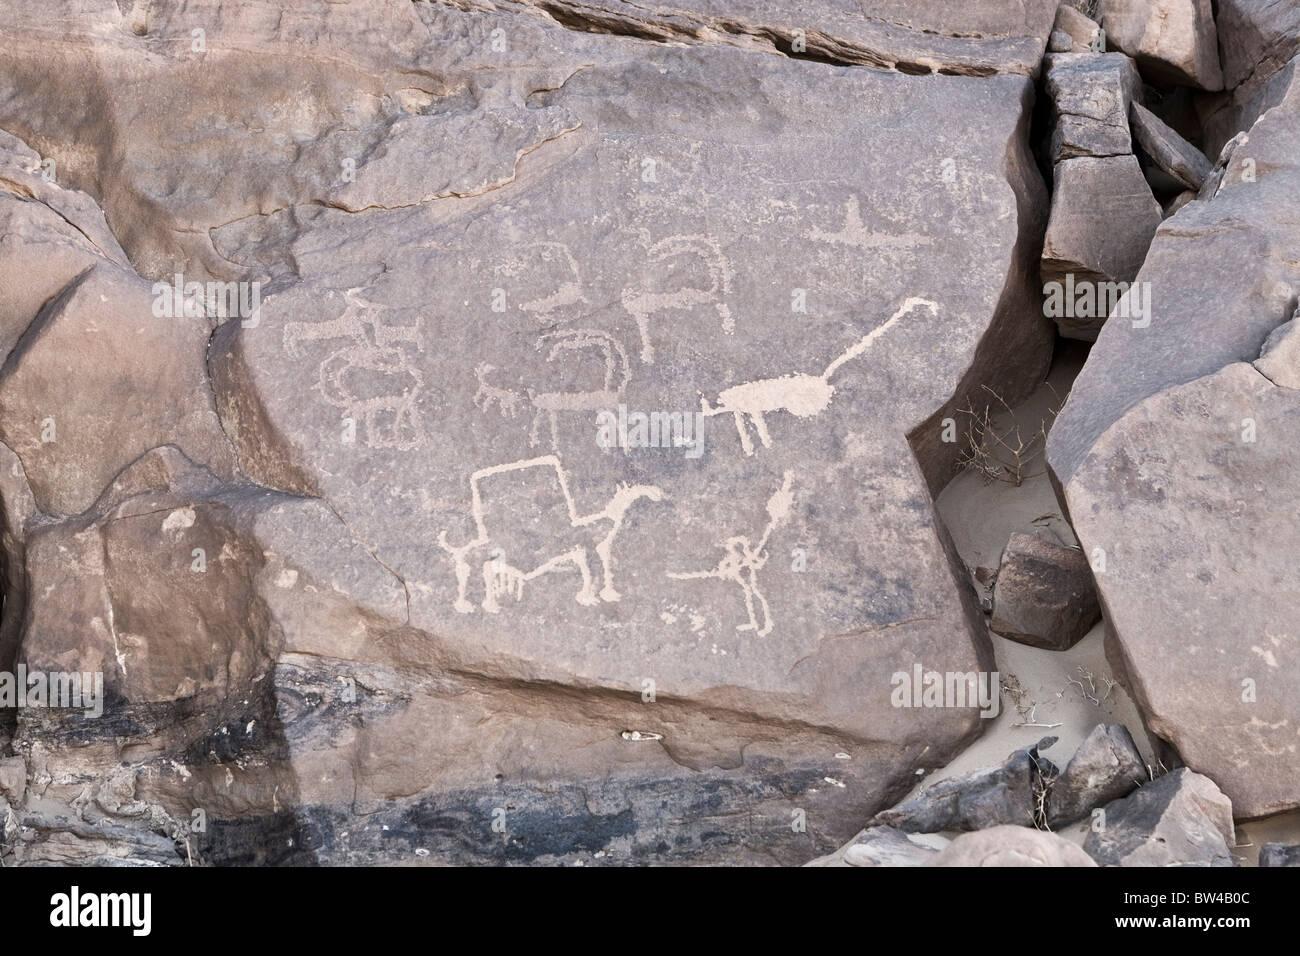 Petroglyphs of various animals in The Eastern Desert of Egypt - Stock Image